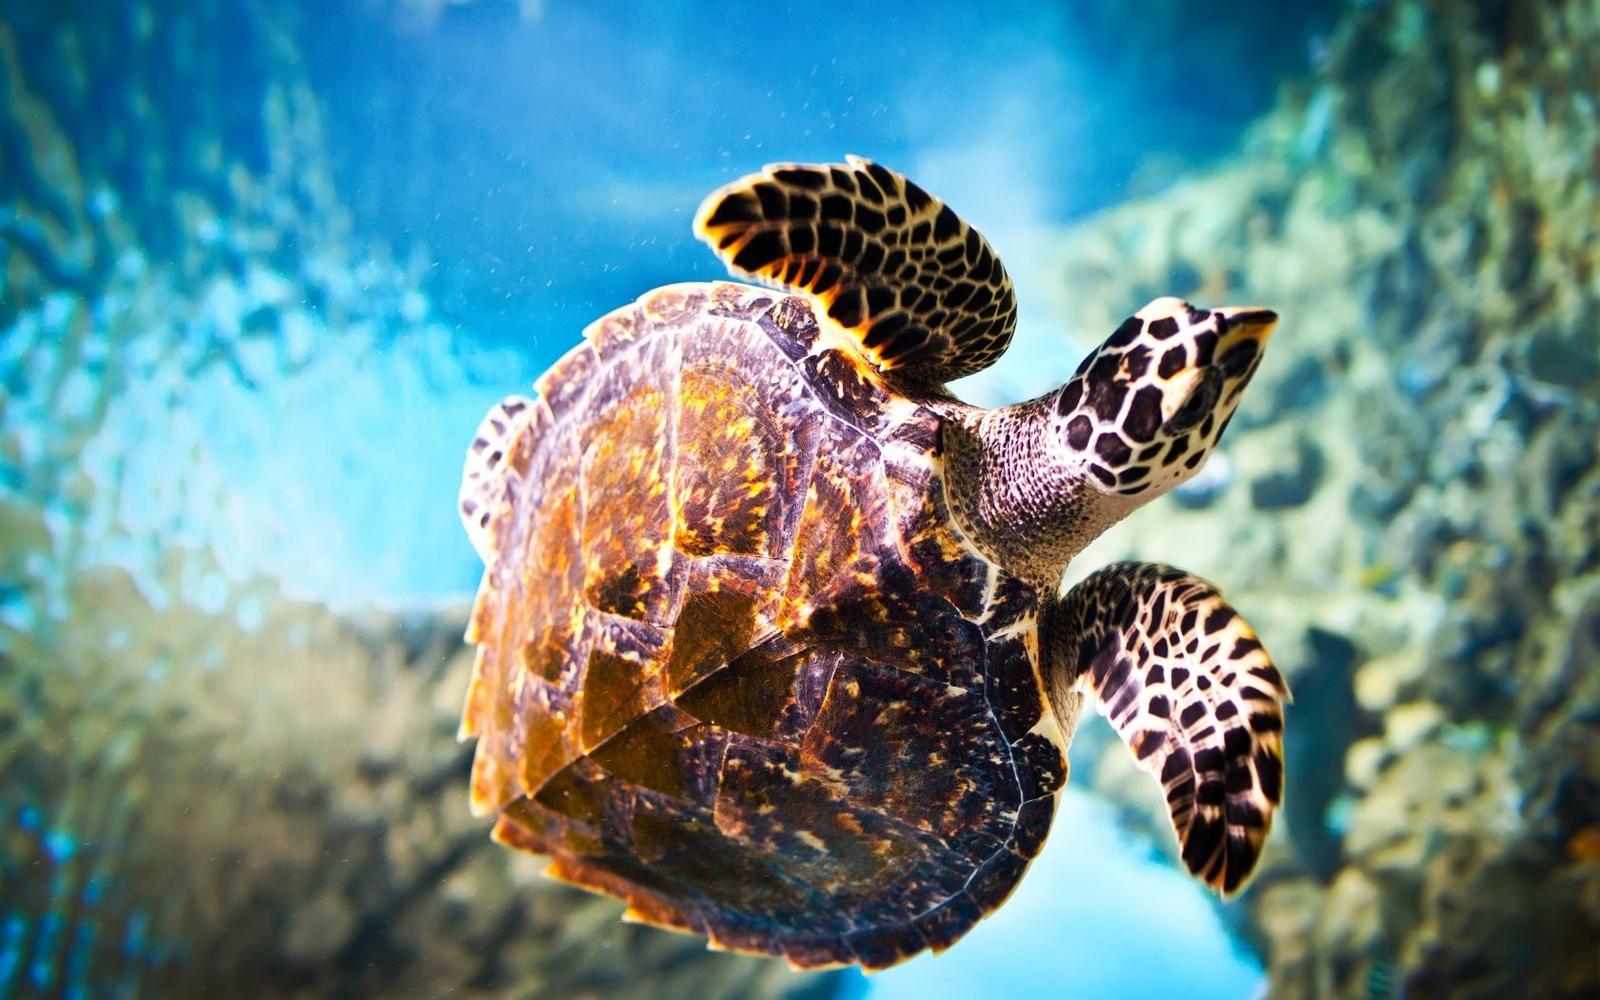 [47+] Animated Sea Turtle Wallpaper iPhone on WallpaperSafari